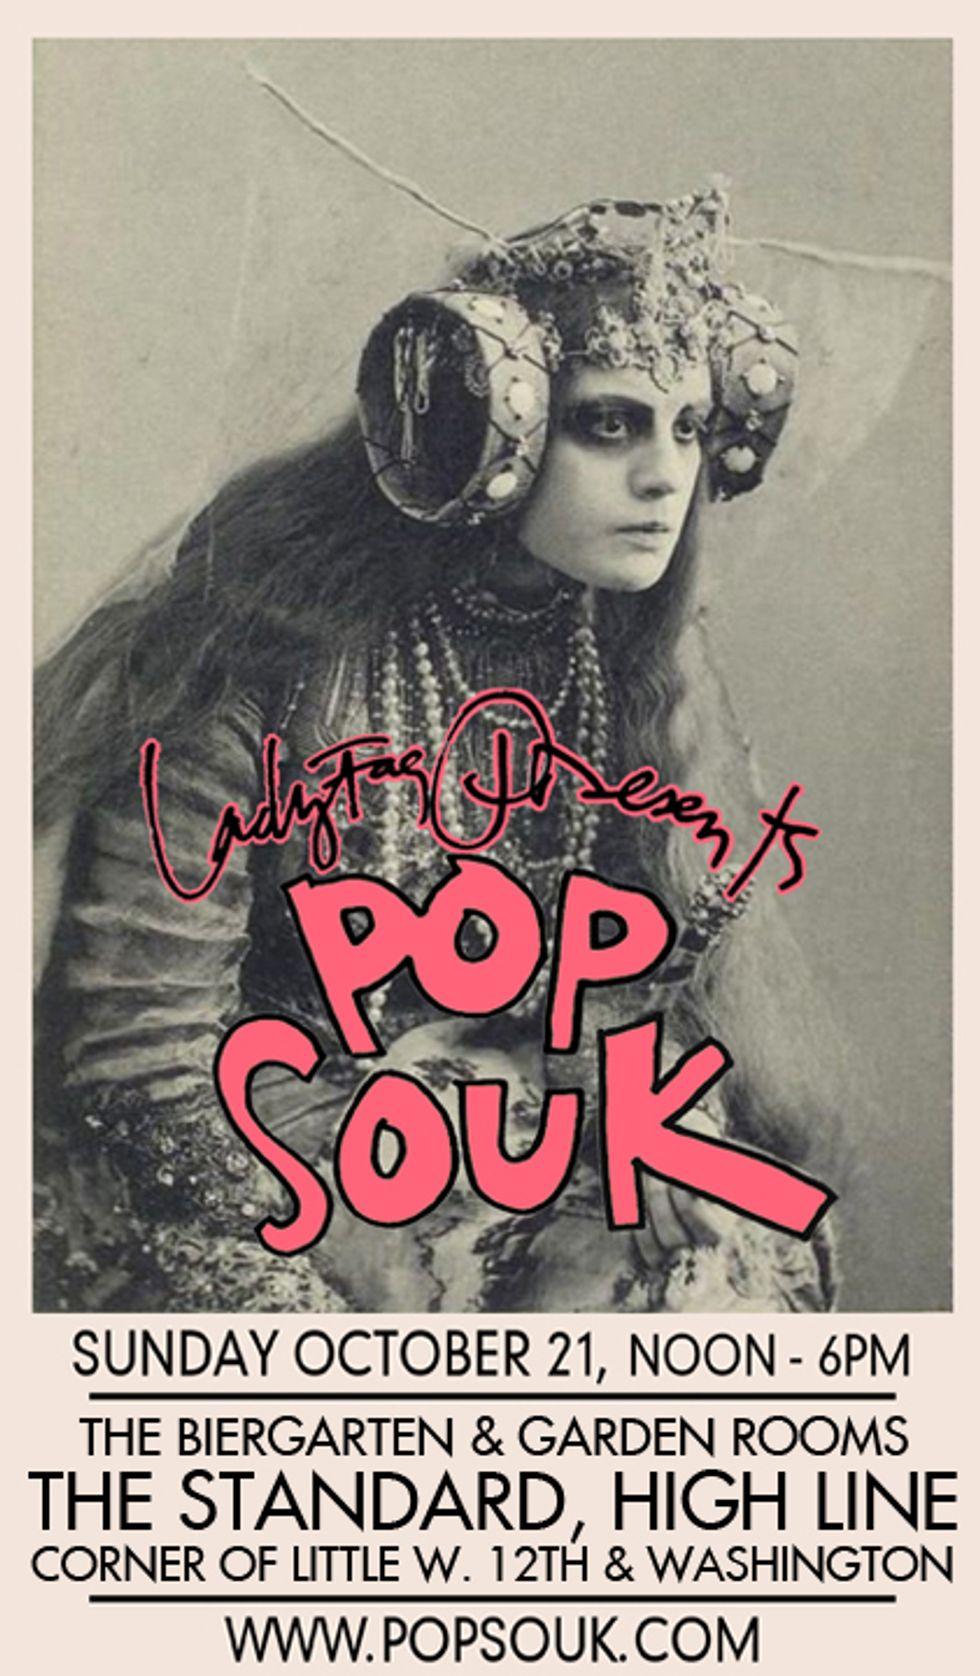 Ladyfag's Pop Souk Bazaar Is Back